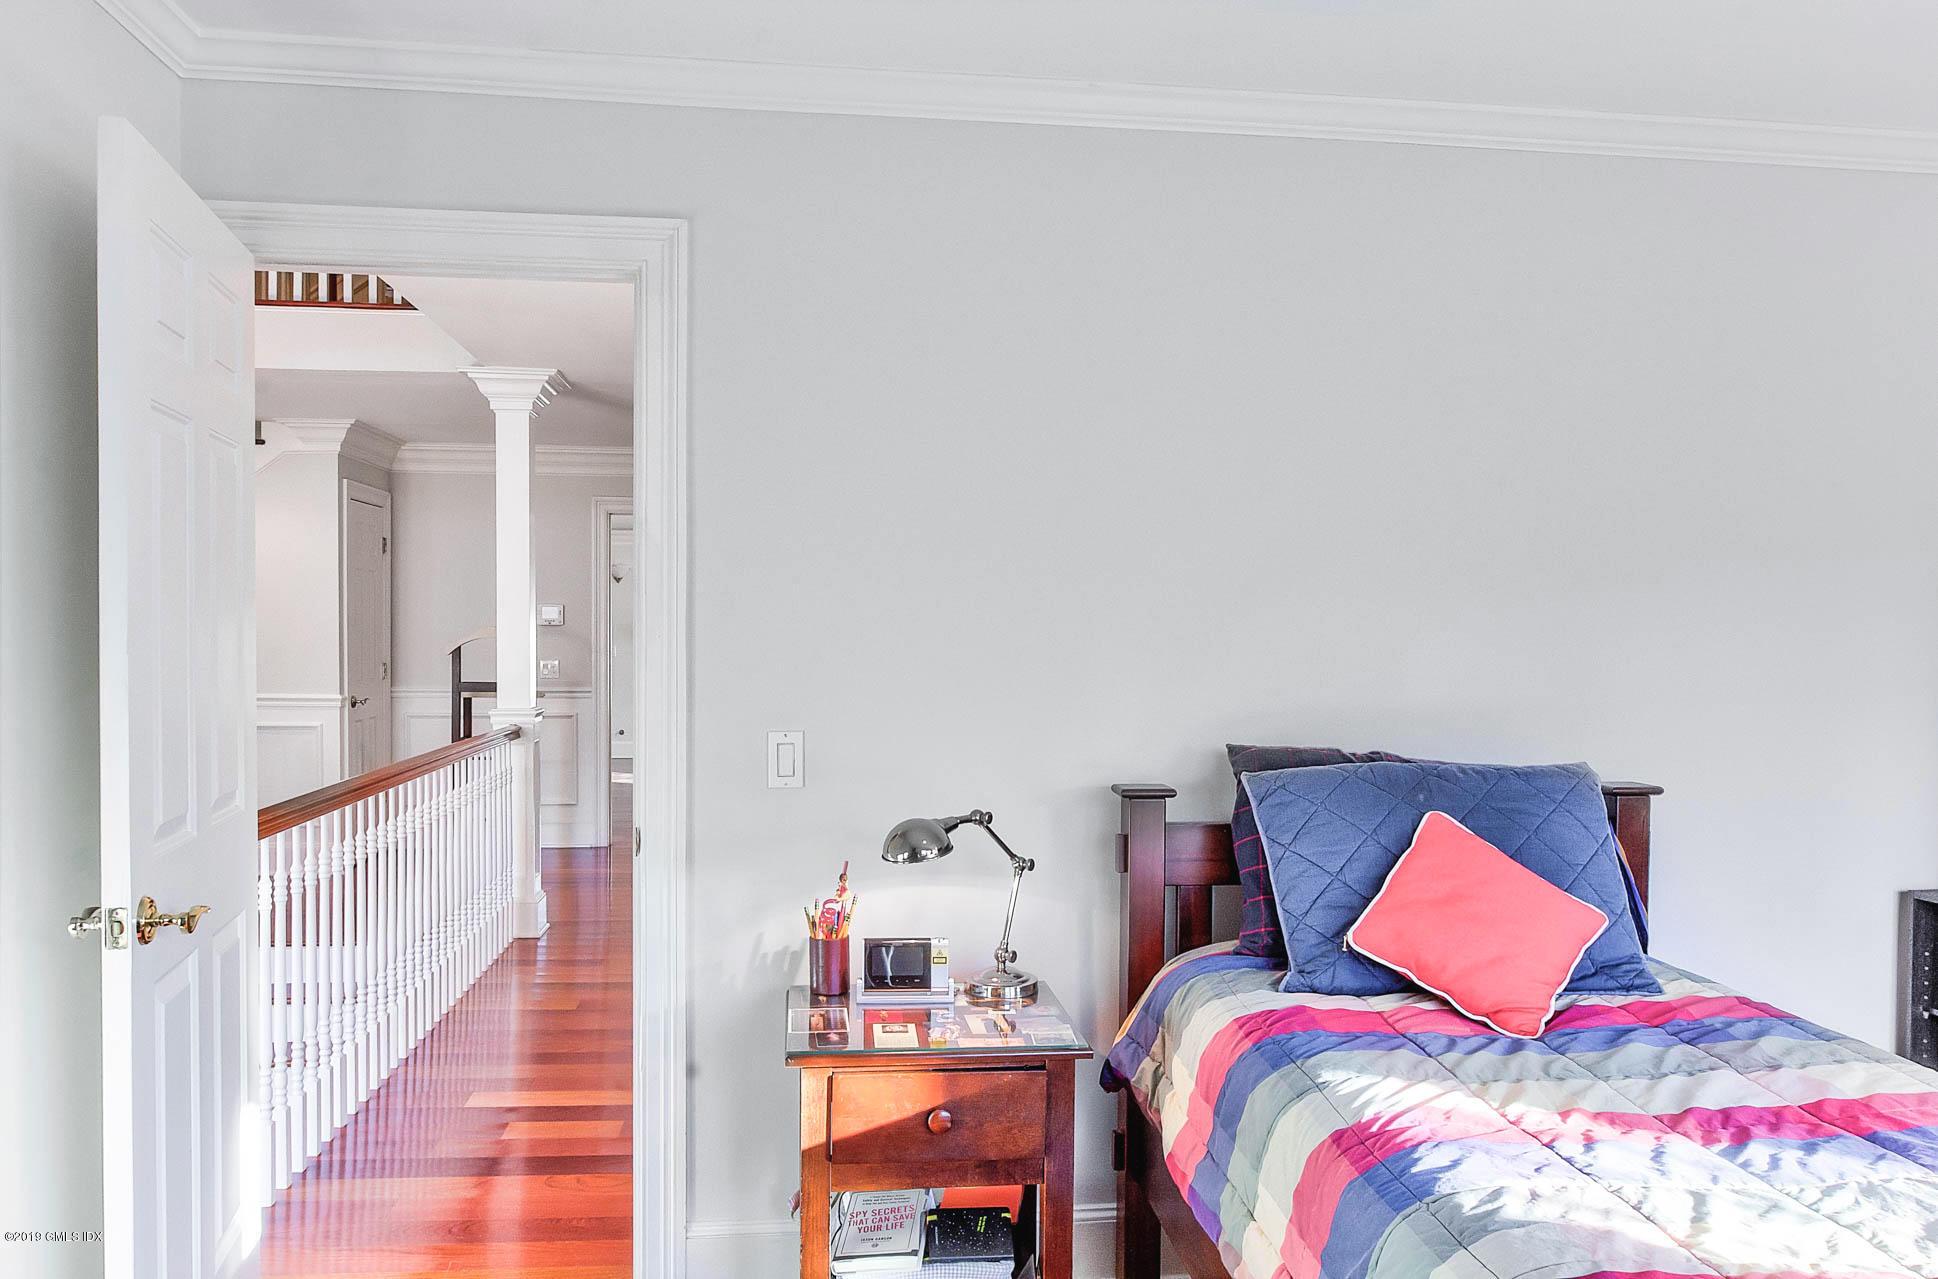 39 Lockwood Lane,Riverside,Connecticut 06878,5 Bedrooms Bedrooms,5 BathroomsBathrooms,Single family,Lockwood,105202